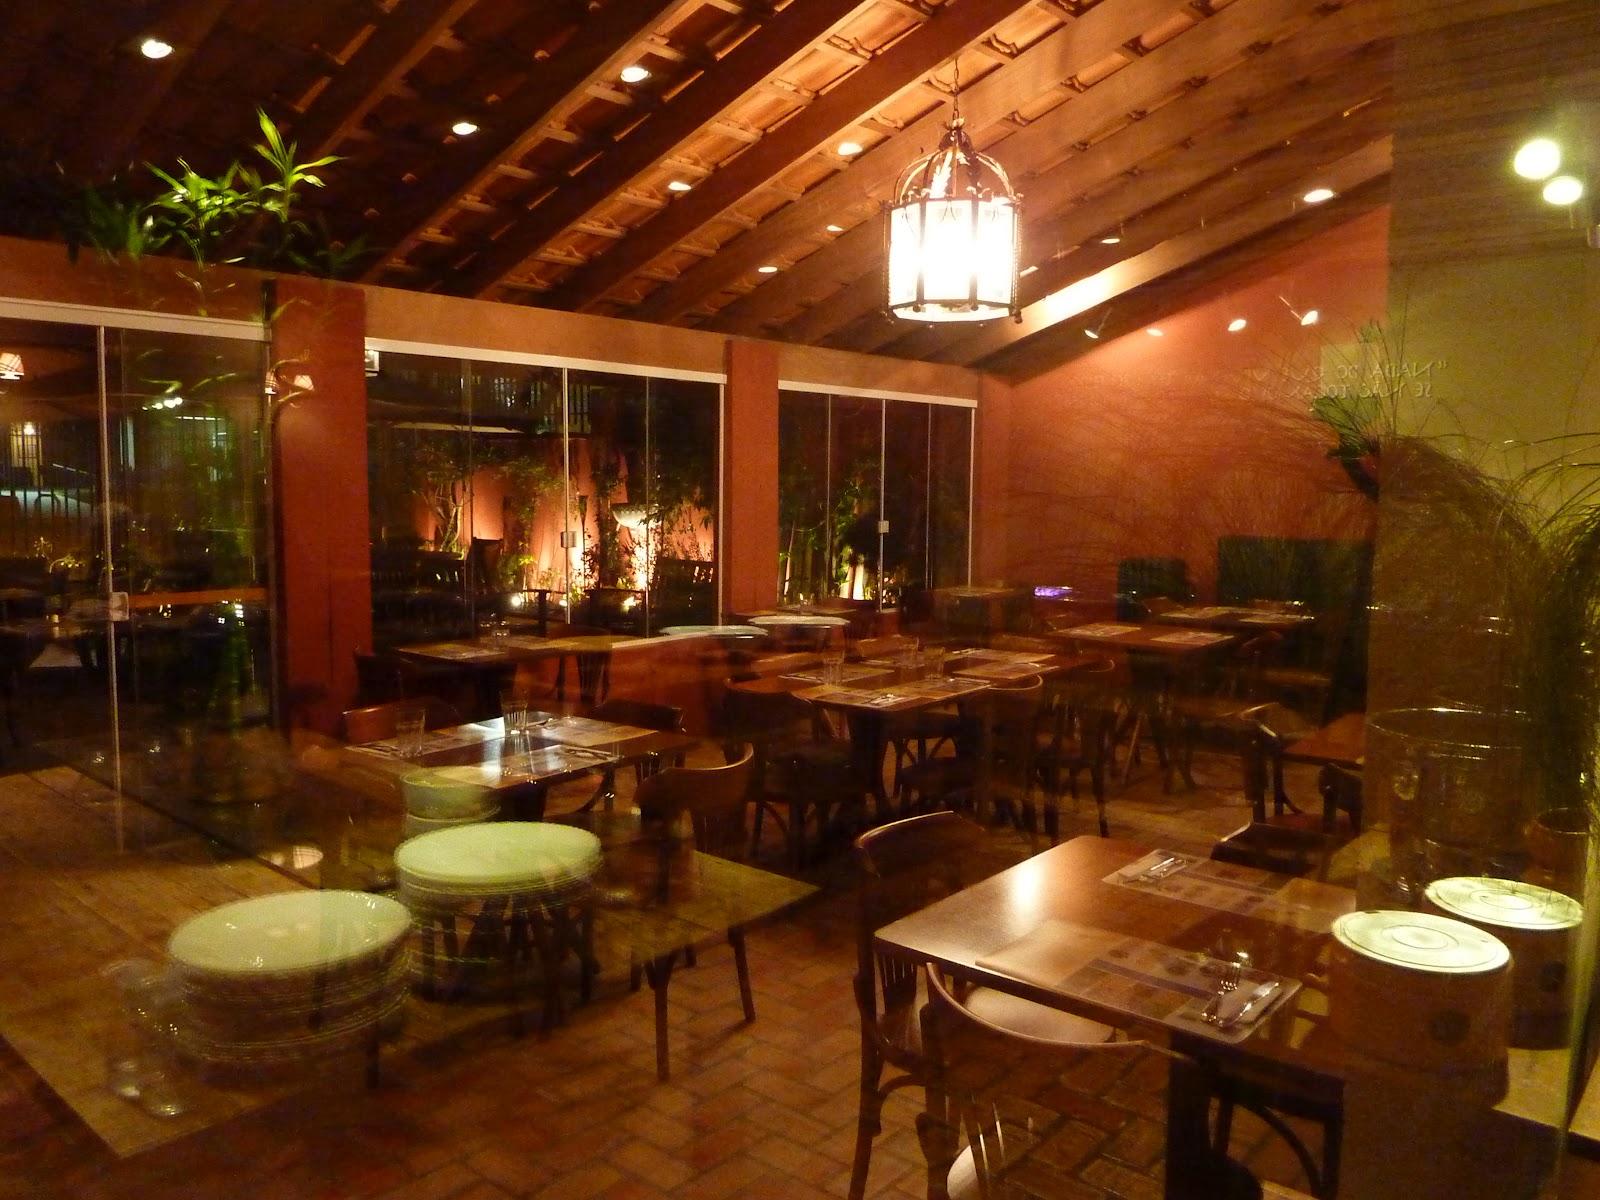 Interior and art design design de interiores restaurante - Interiores de restaurantes ...